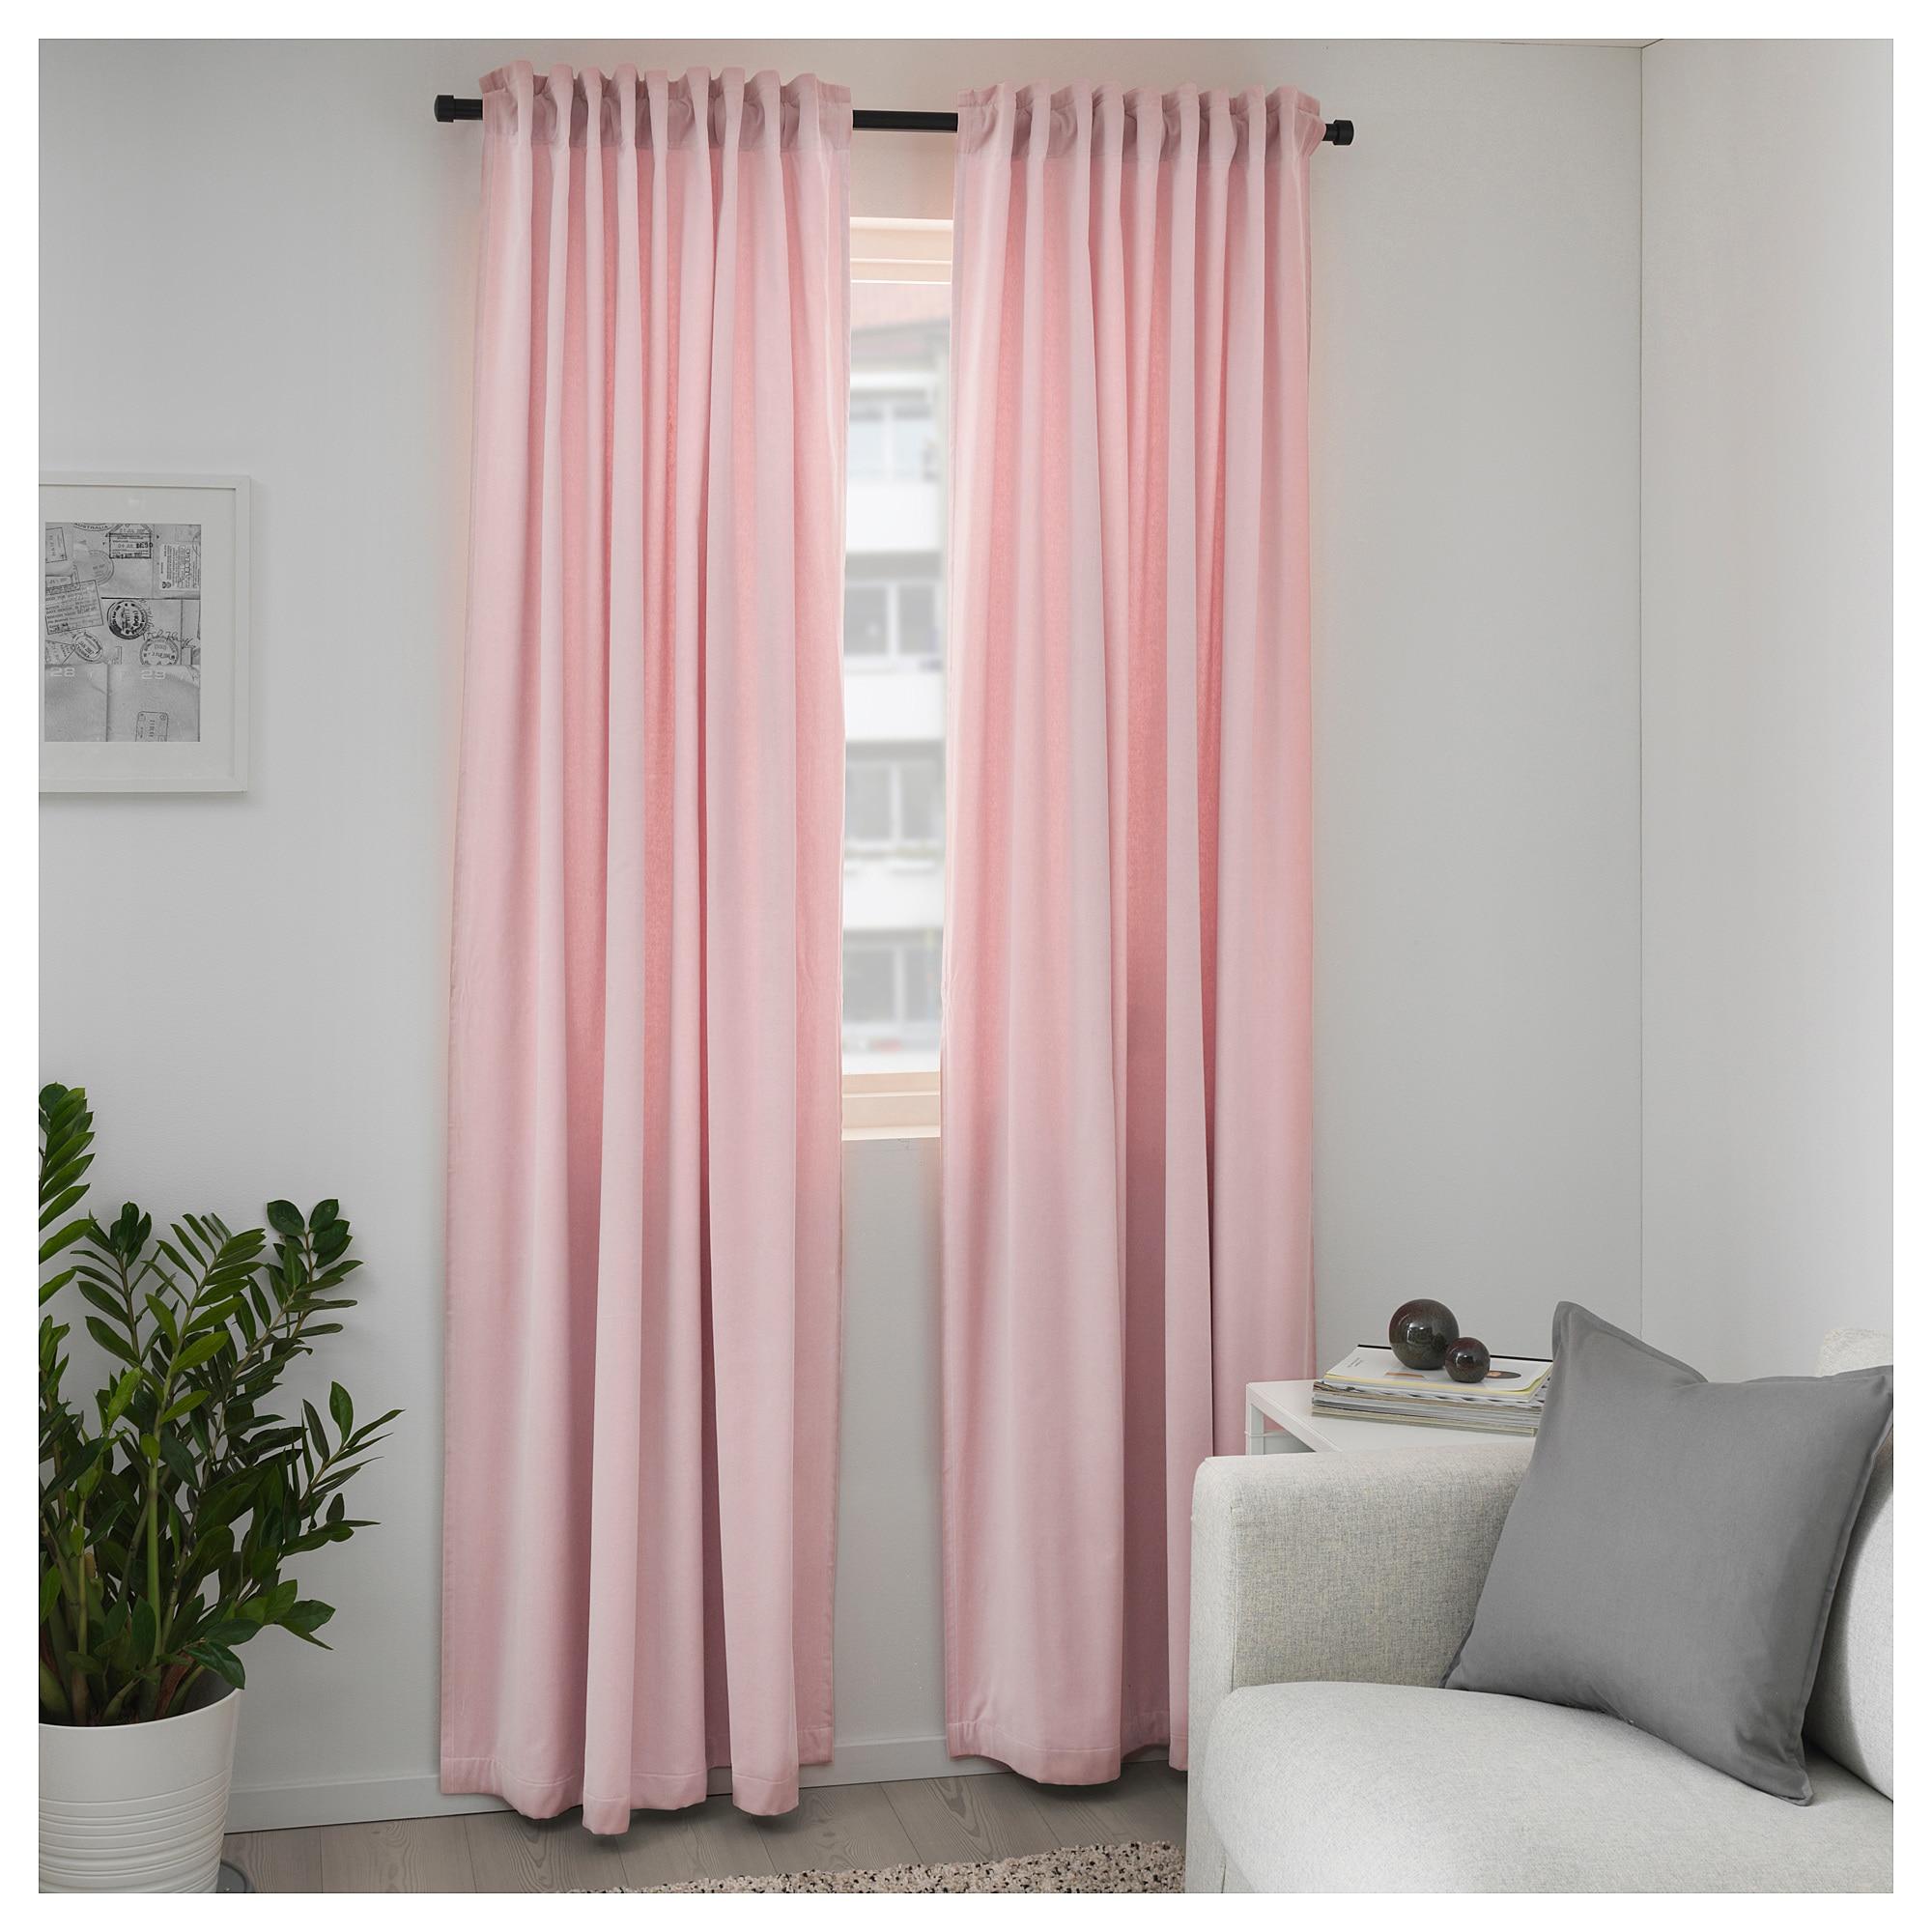 Sanela Room Darkening Curtains 1 Pair Light Pink In 2019